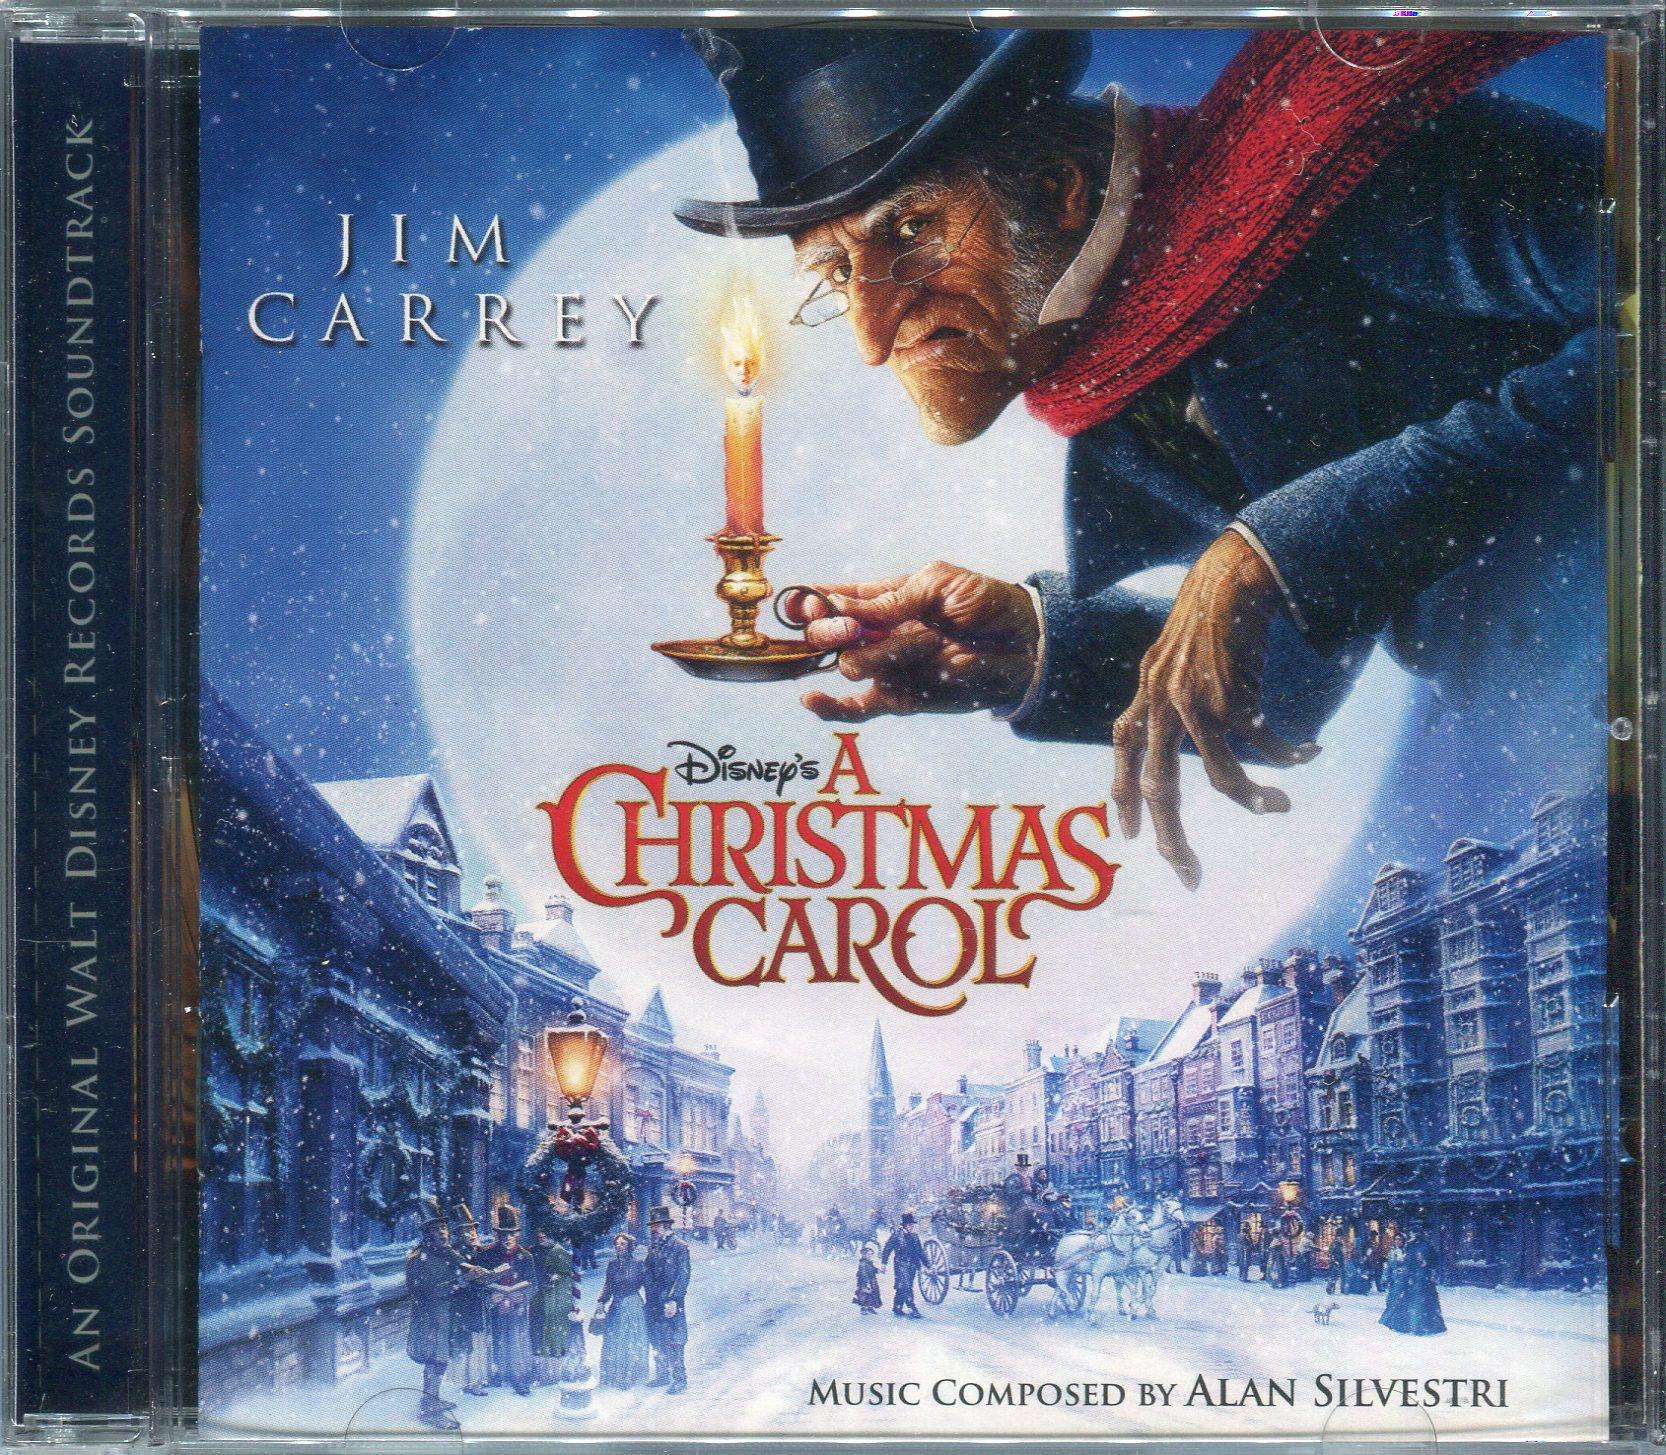 A CHRISTMAS CAROL | Itscorez Itscorez